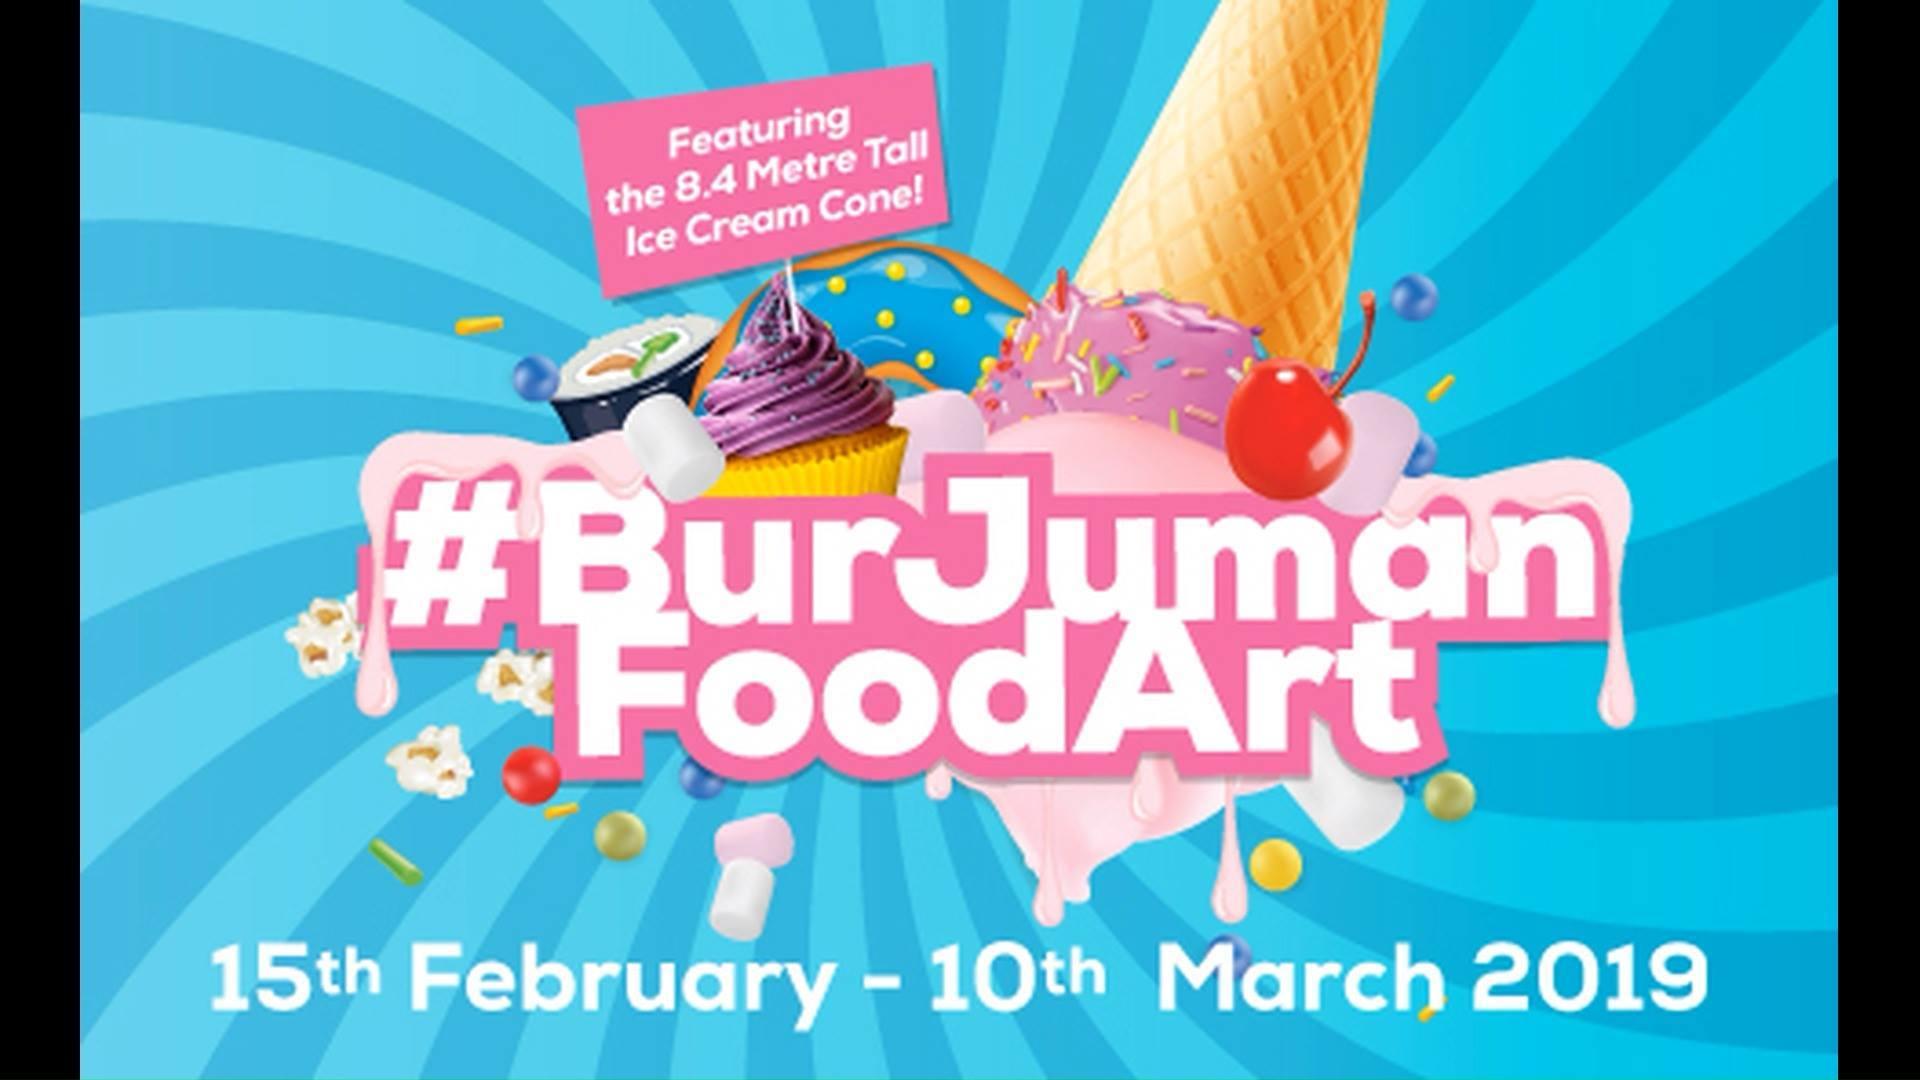 FOOD ART DUBAI